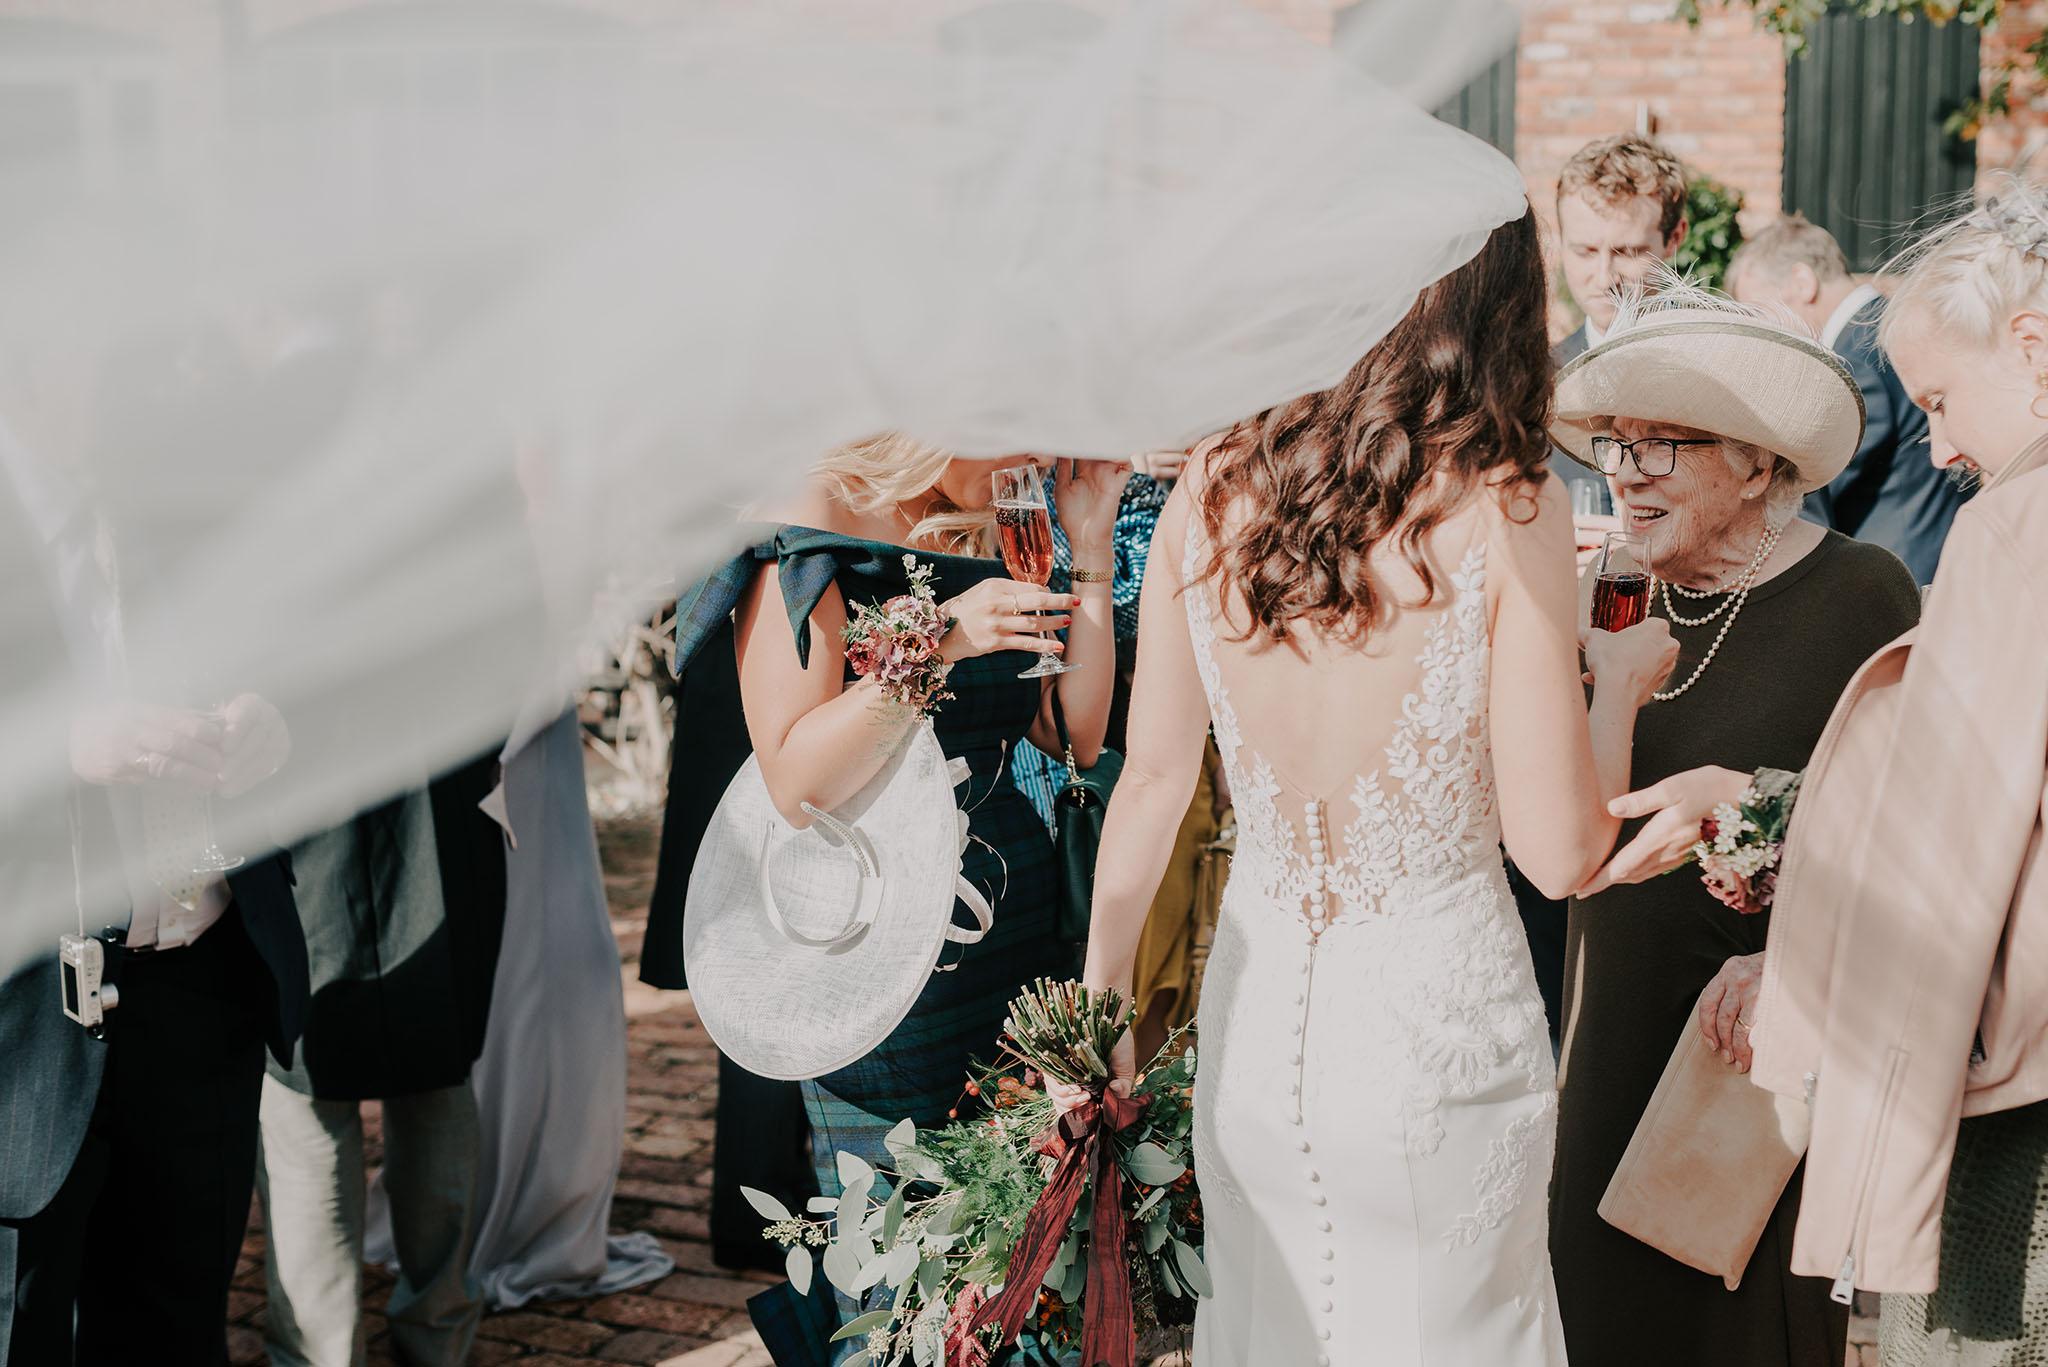 scott-stockwell-photography-wedding-52.jpg